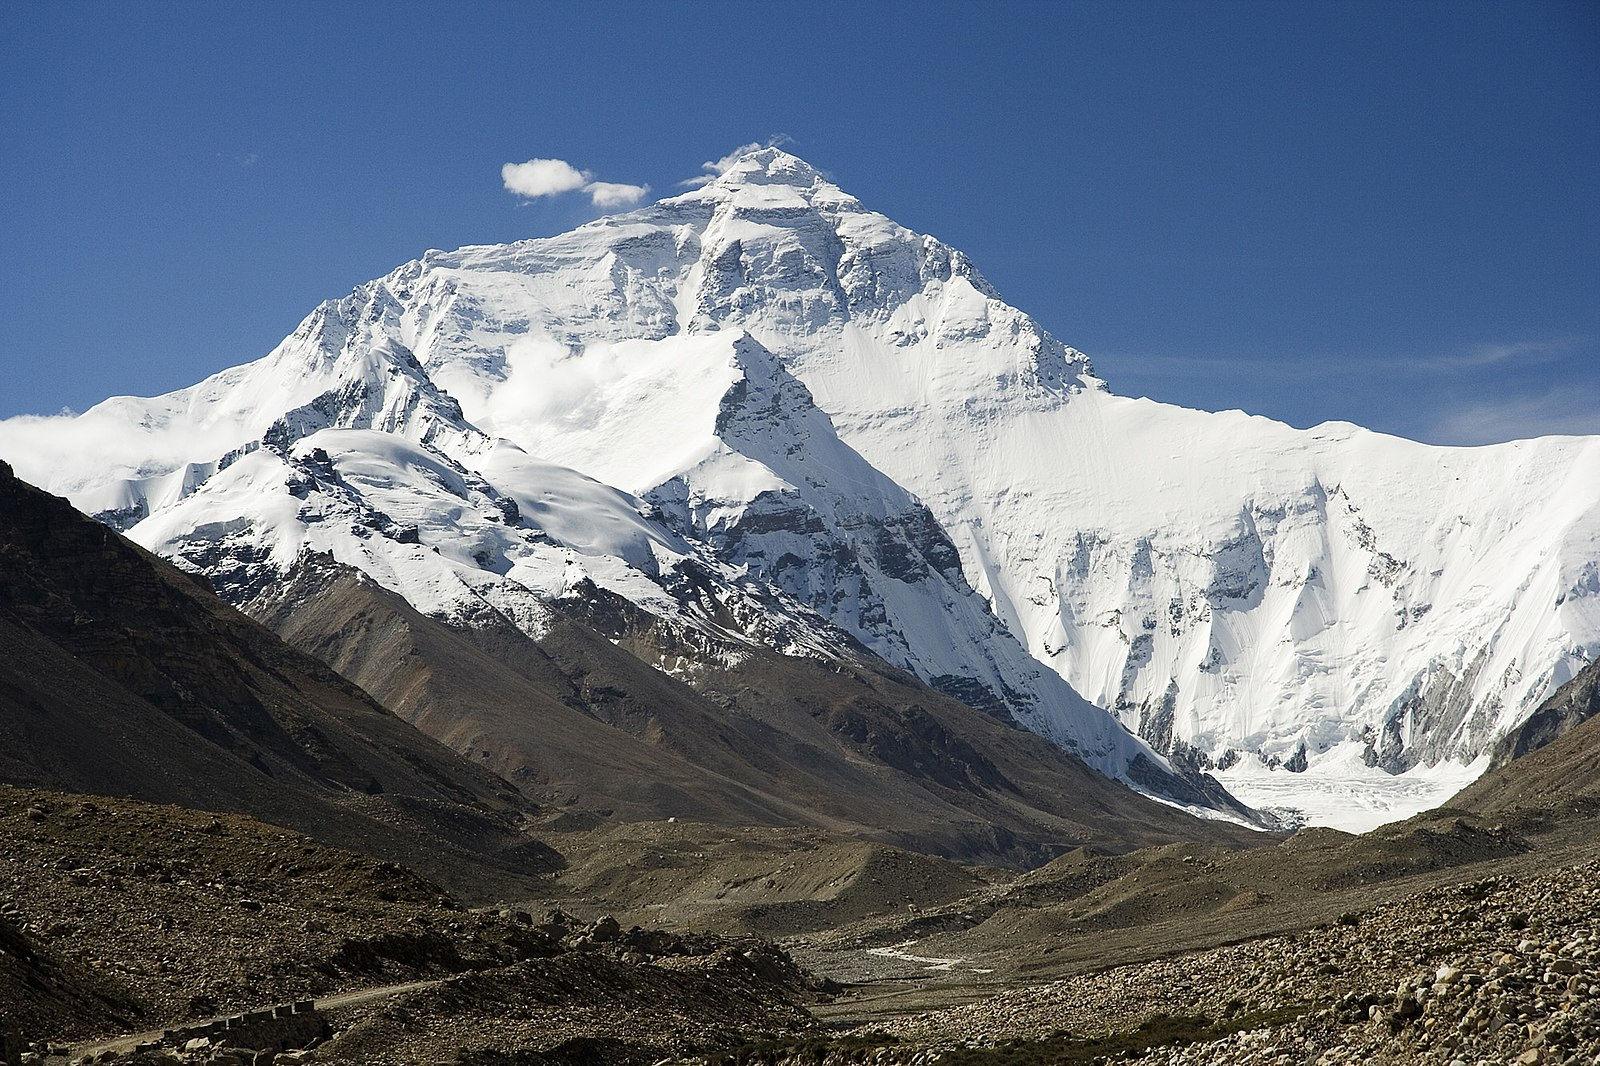 1600px Everest North Face toward Base Camp Tibet Luca Galuzzi 2006